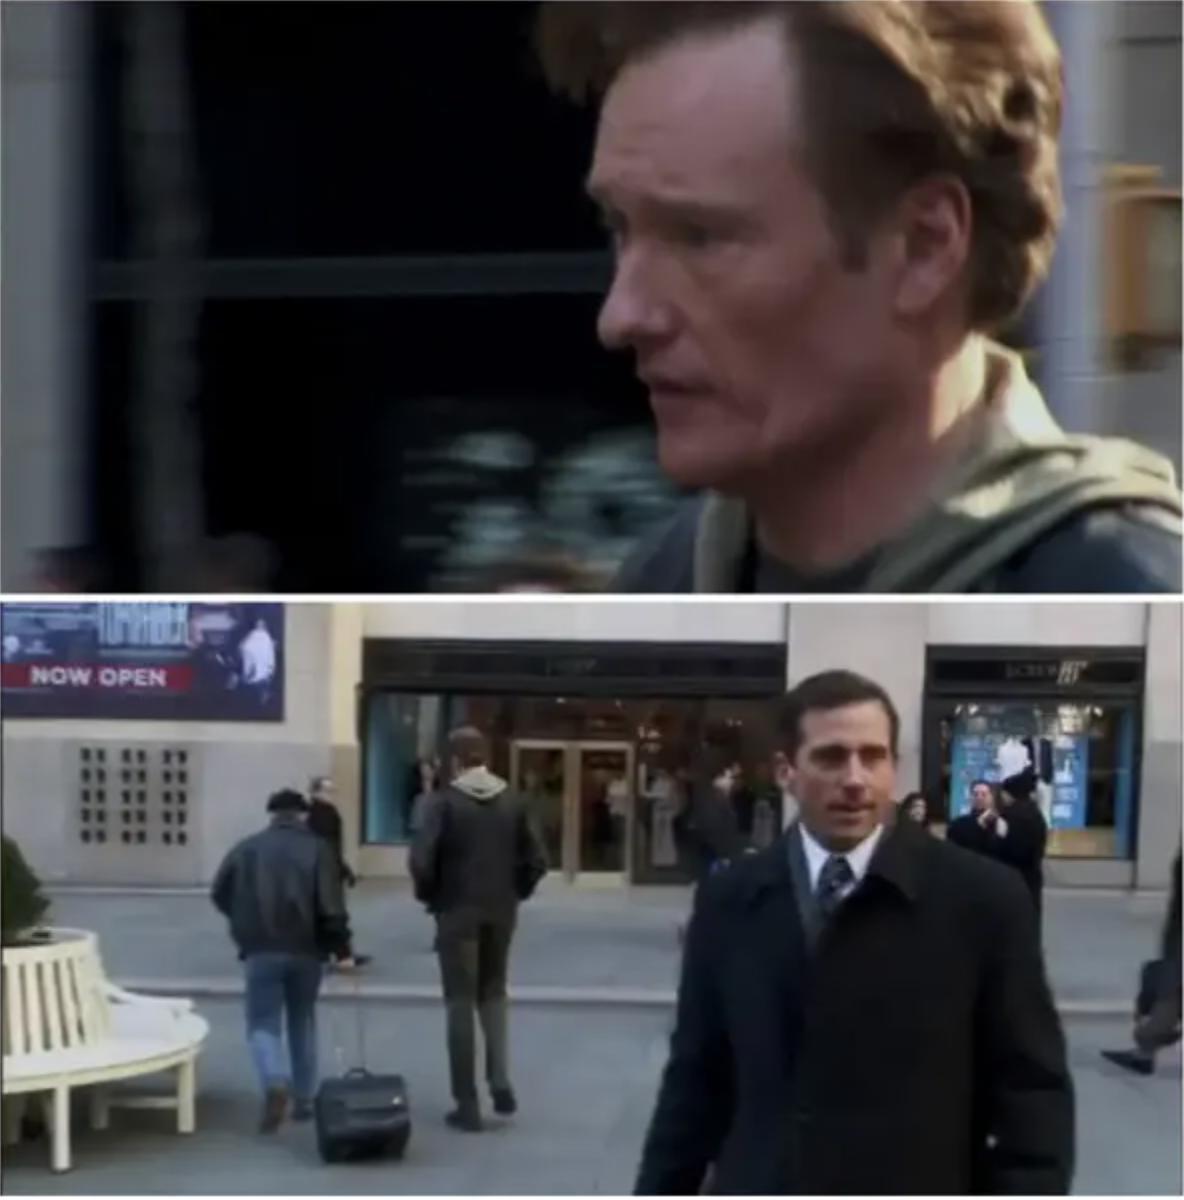 Conan walks past Michael Scott who doesn't notice